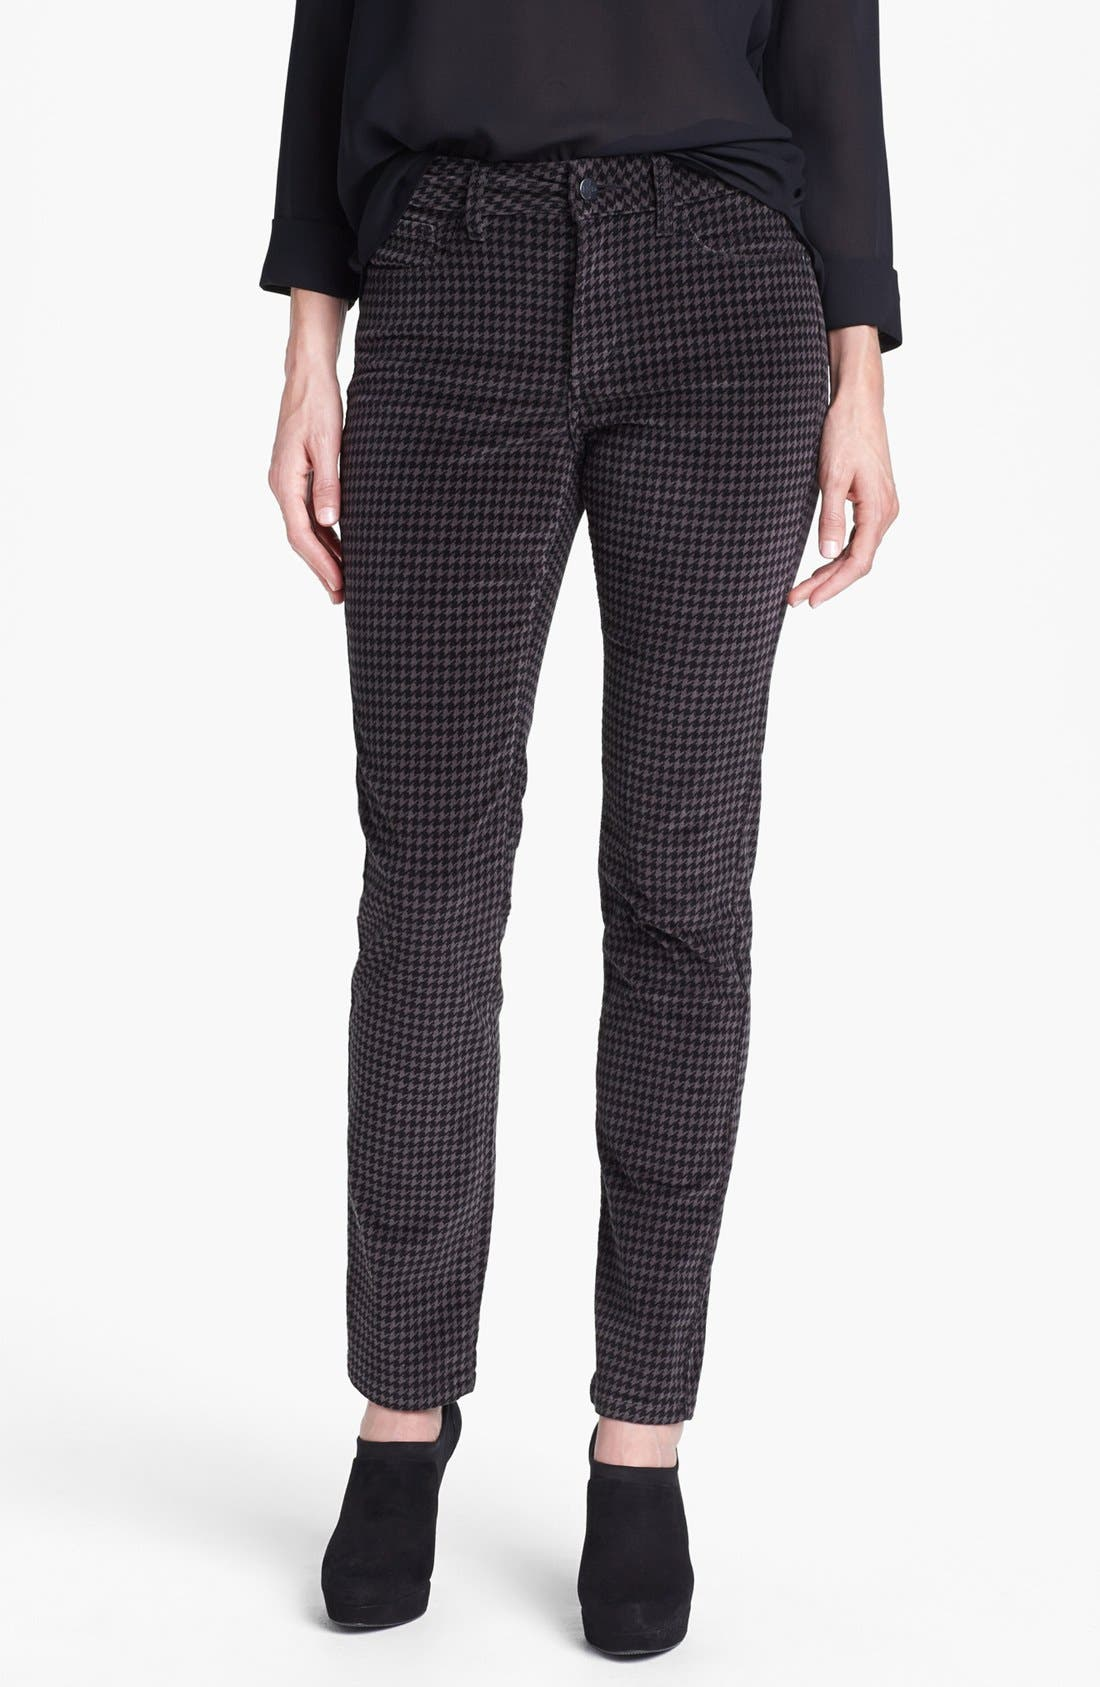 Alternate Image 1 Selected - NYDJ Houndstooth Stretch Corduroy Pants